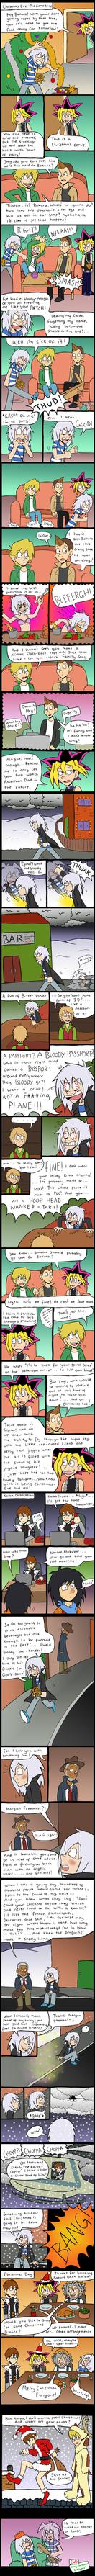 Ryou's Christmas Adventure by indecisivepancake